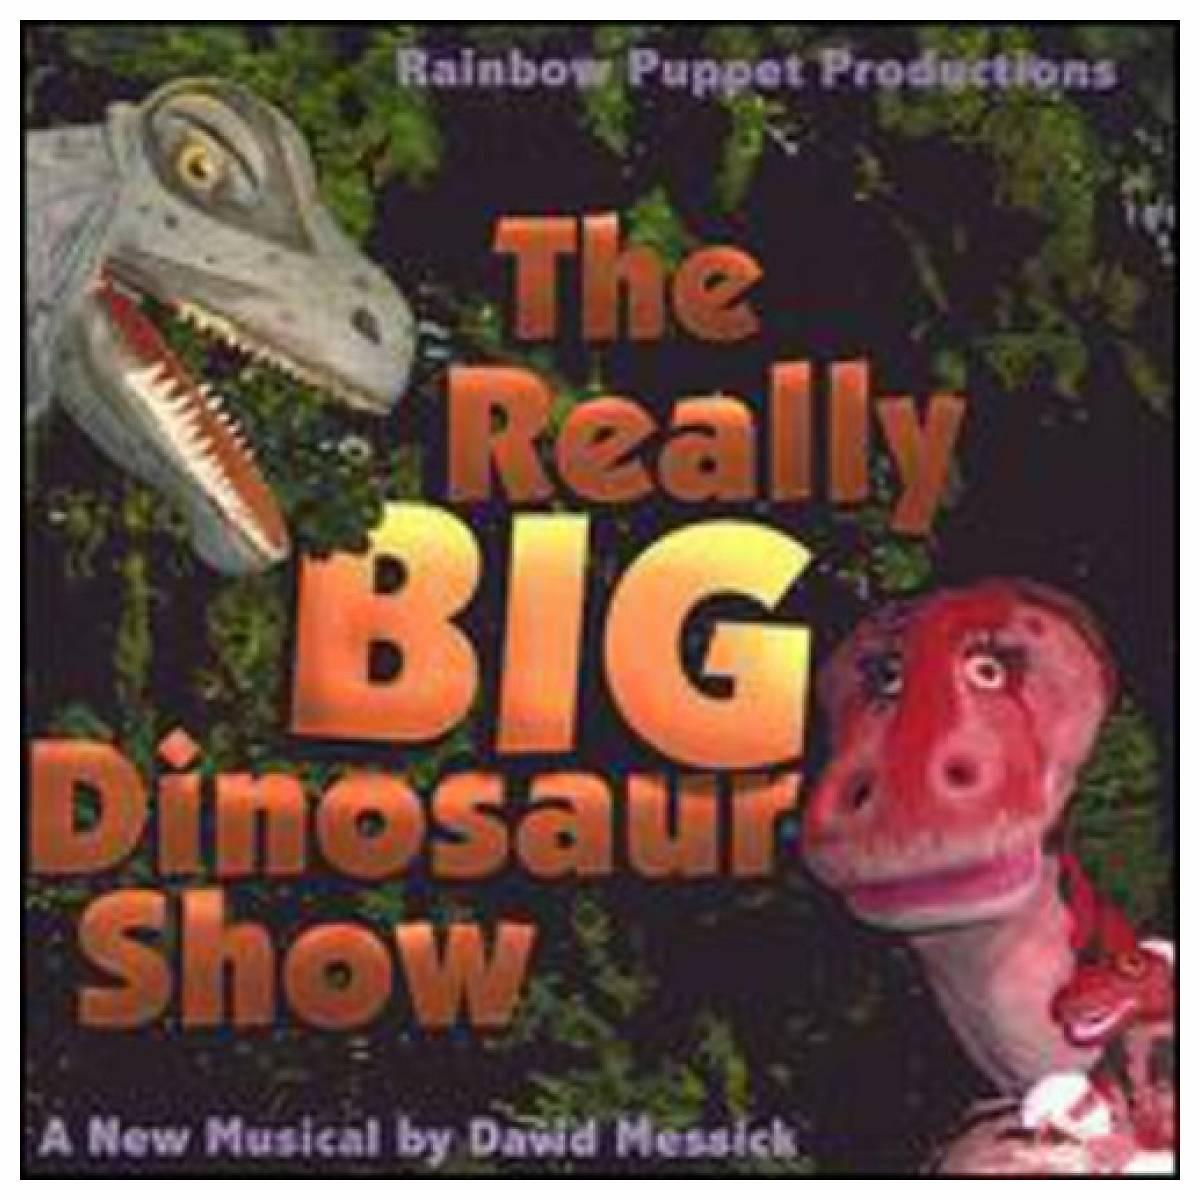 Wide Eyed Wanda's Wondrous Wetland Review - Rainbow Puppet Productions - Musik - Rainbow Puppet Productions - 0752359571525 - May 14, 2002